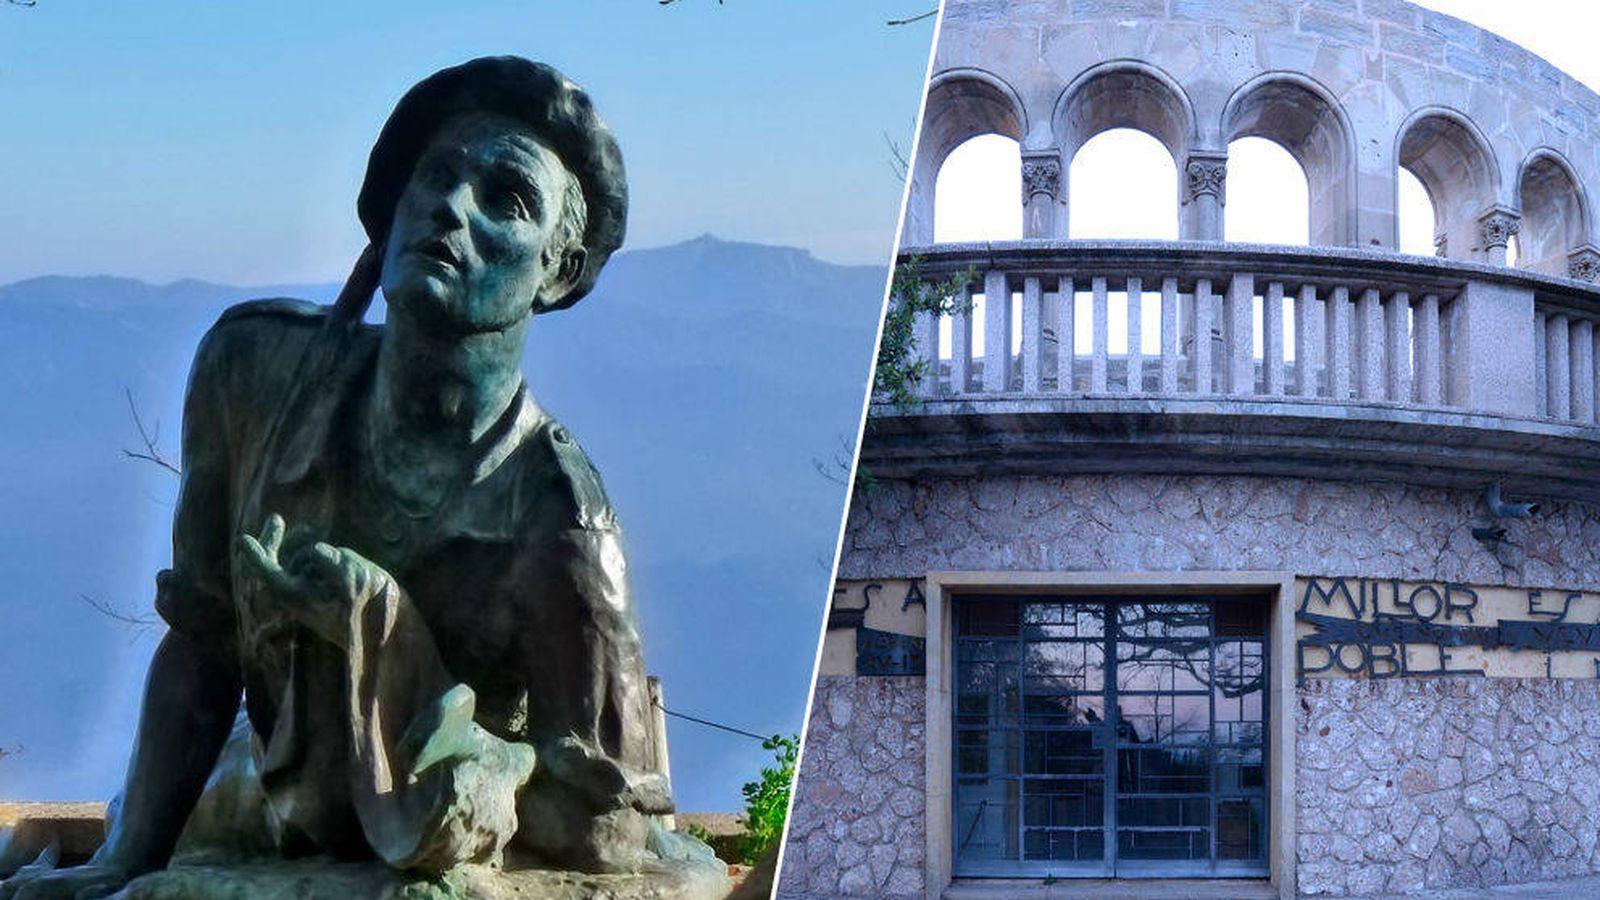 Foto: A la izquierda, la escultura en honor a los requetés, a la derecha la cripta.